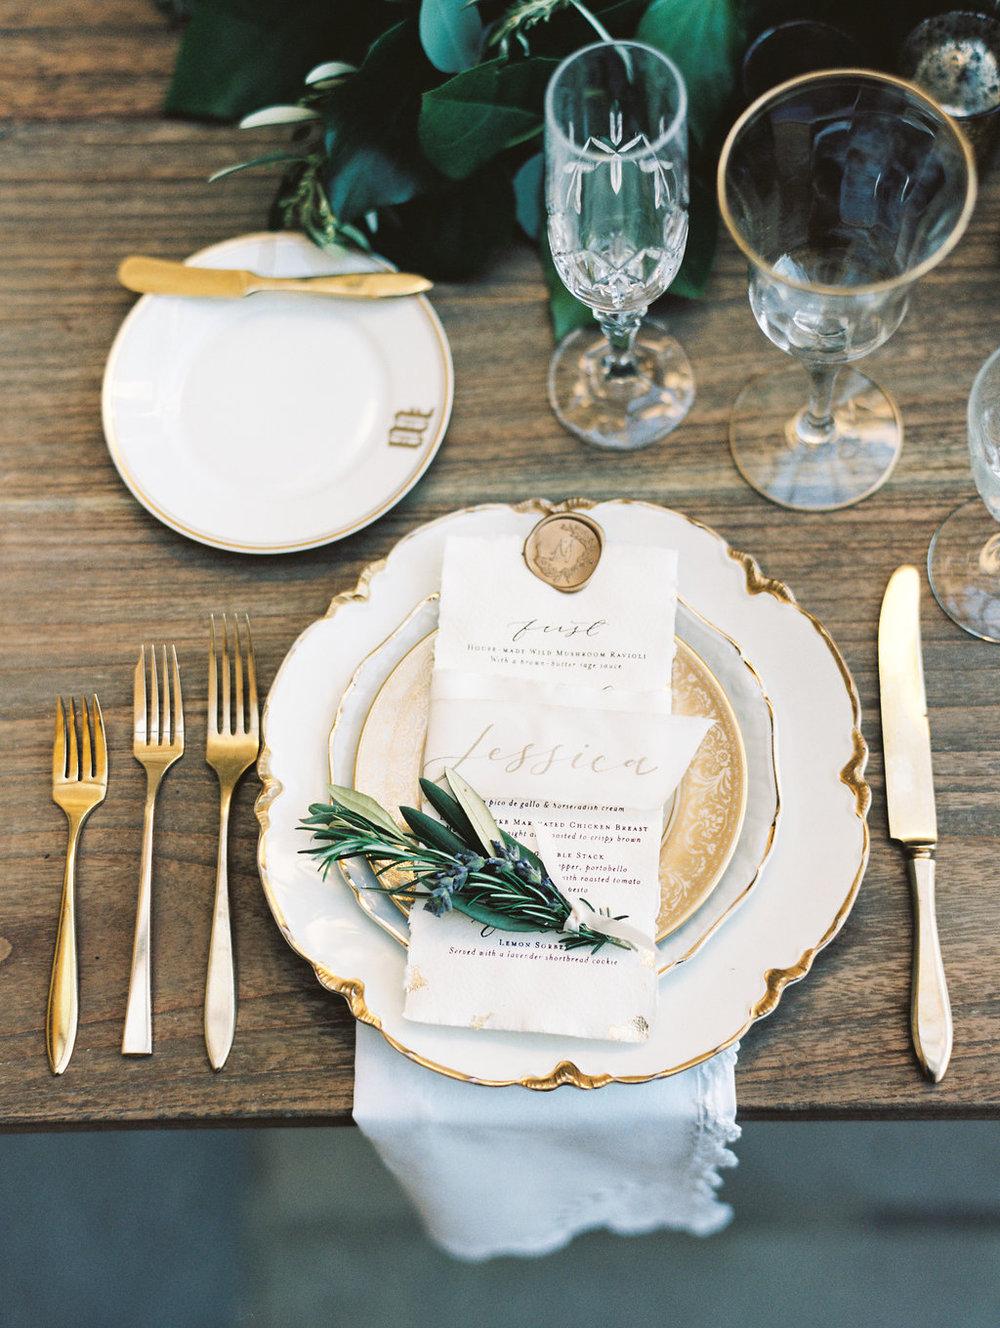 160402_Coombs_Wedding_1276-SR34364Sne042803-R7-098.jpg